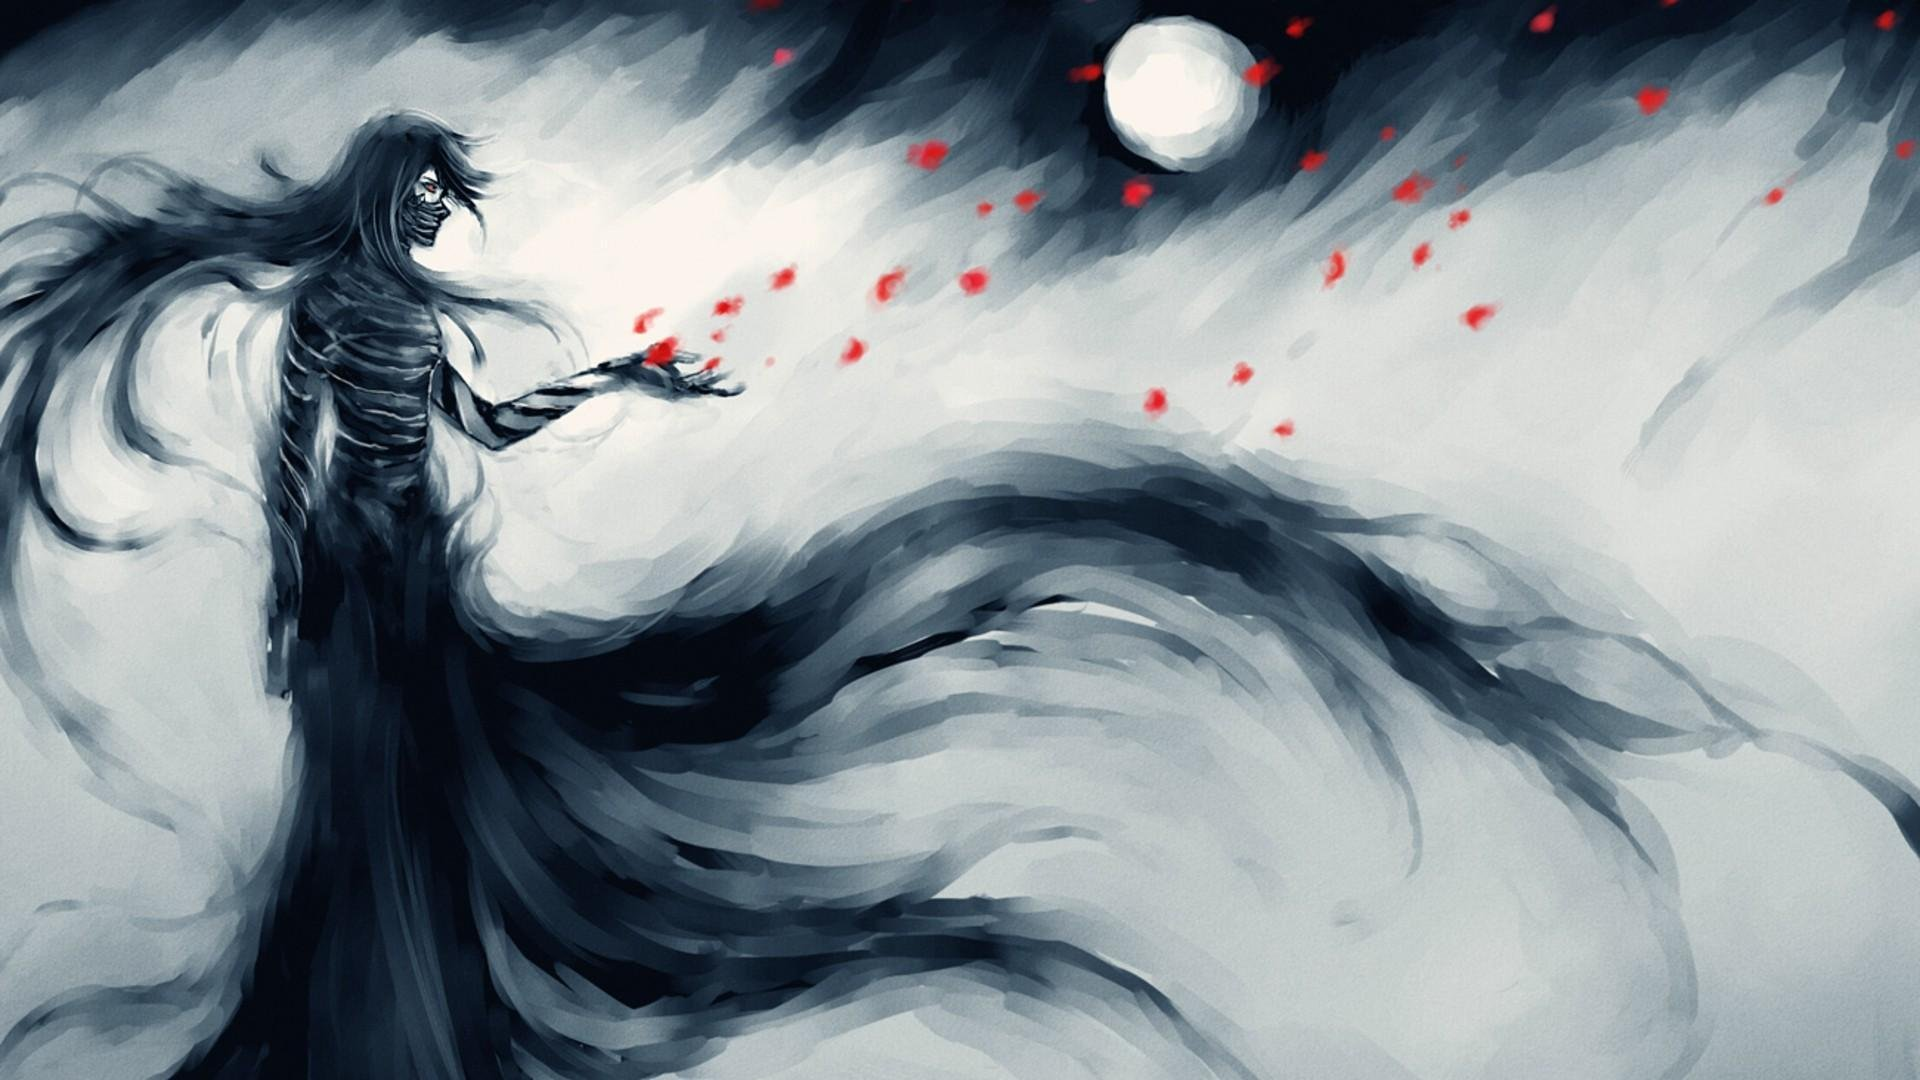 Epic warrior bleach anime ichigo kurosaki wallpaper 1920x1080 1920x1080